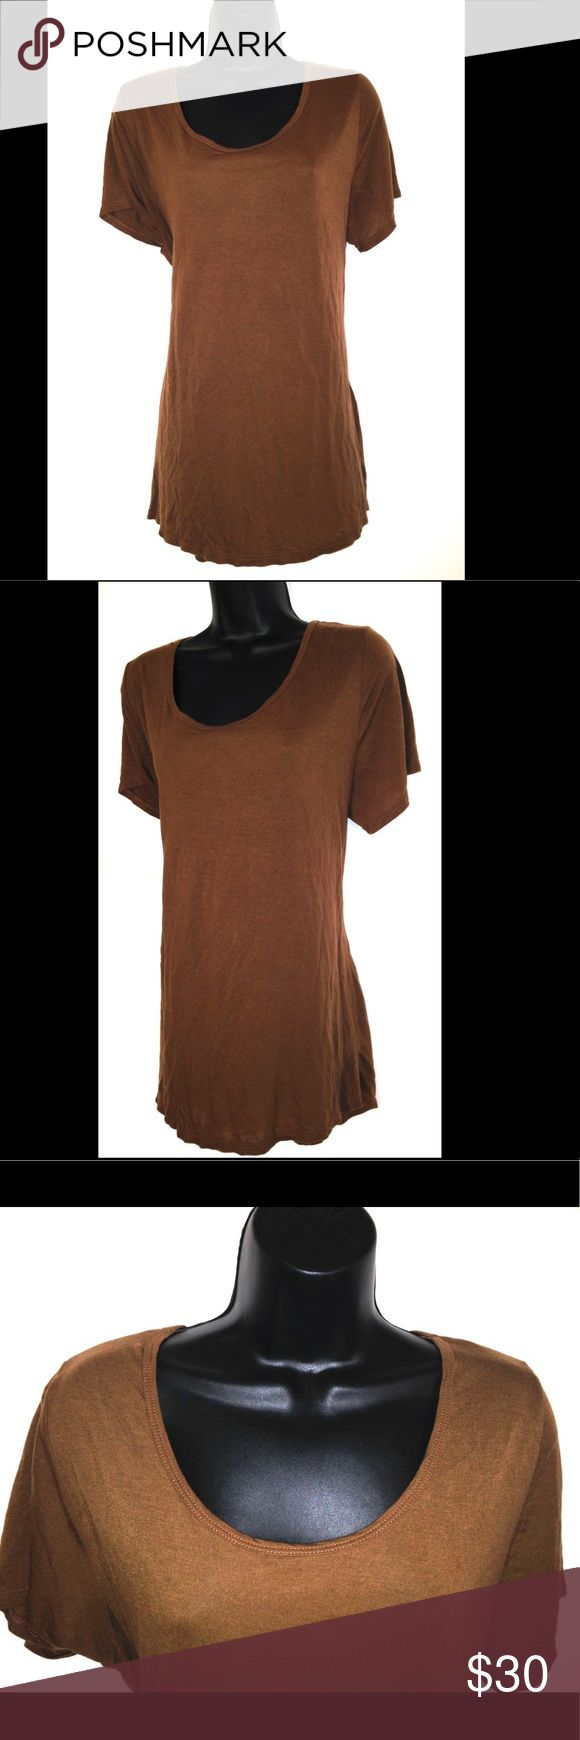 Lularoe Classic XL Shirt Dark Brown Womens T-Shirt Lularoe Classic XL Shirt Dark Brown Womens T-Shirt Top LuLaRoe Tops